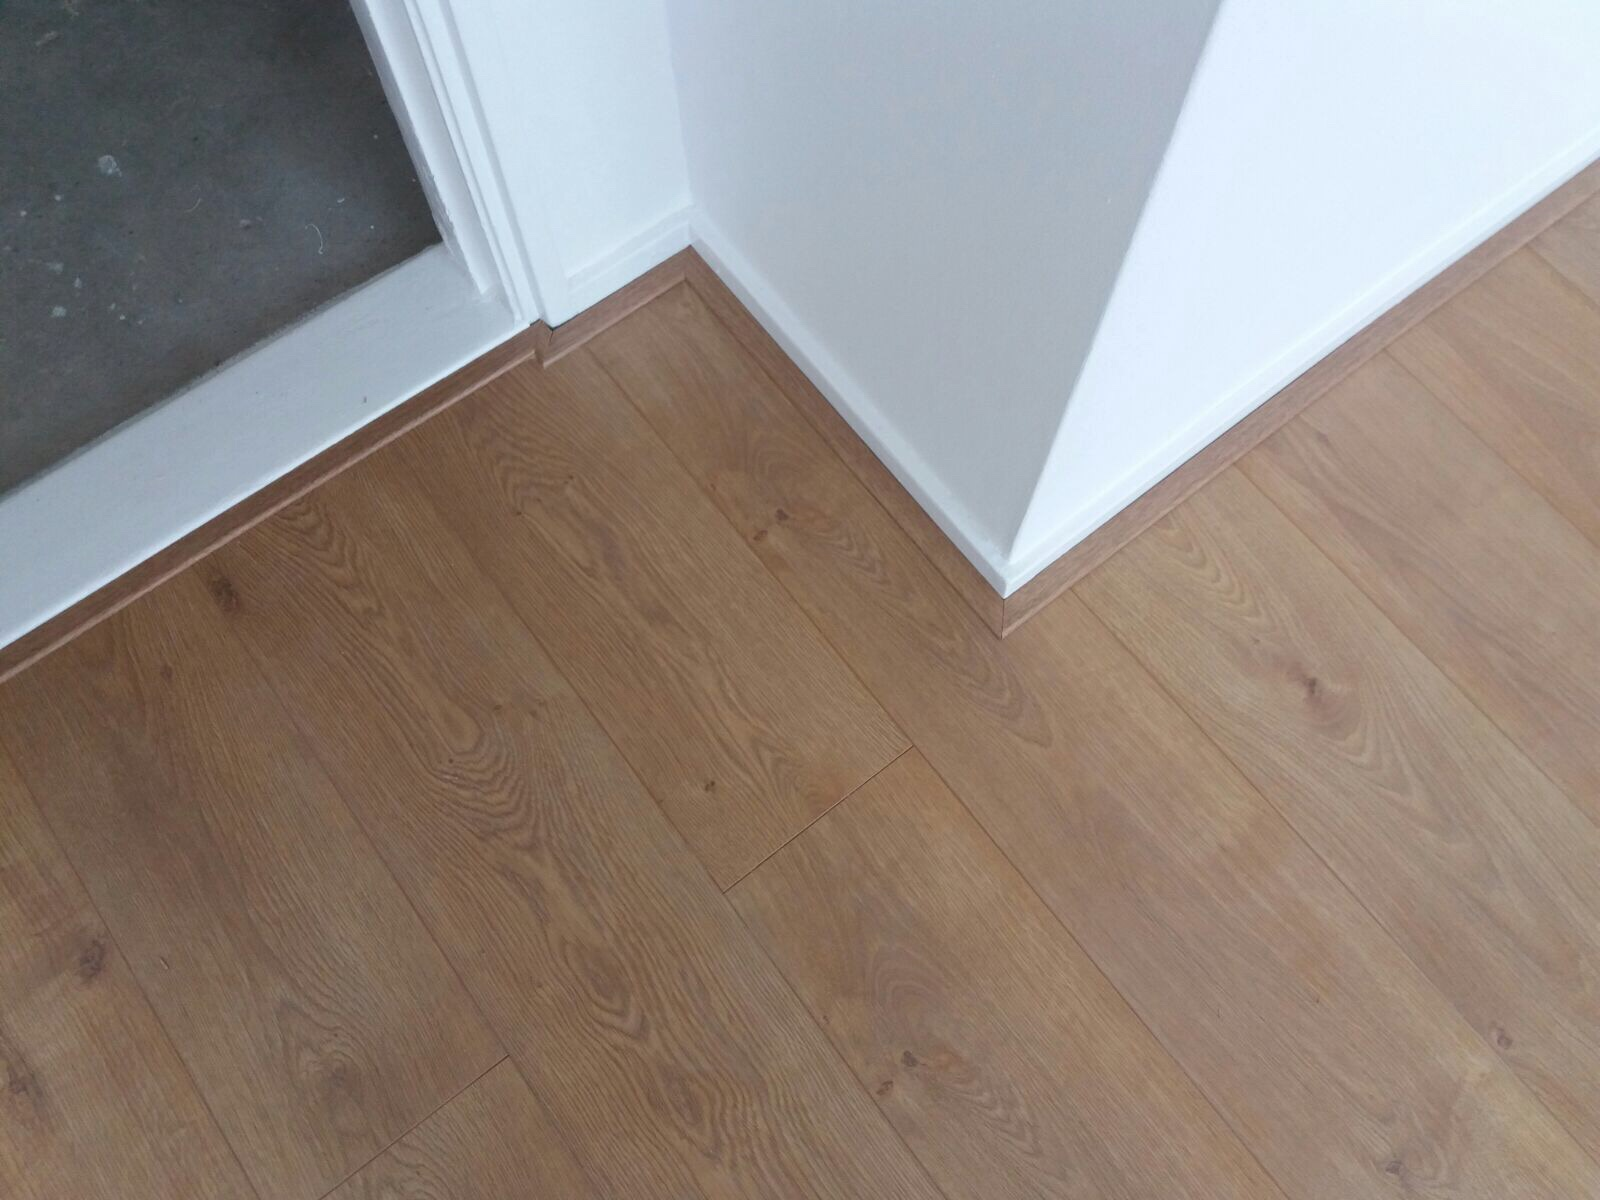 Slaapkamer laminaat+ondervloer leggen 11m2 - Werkspot